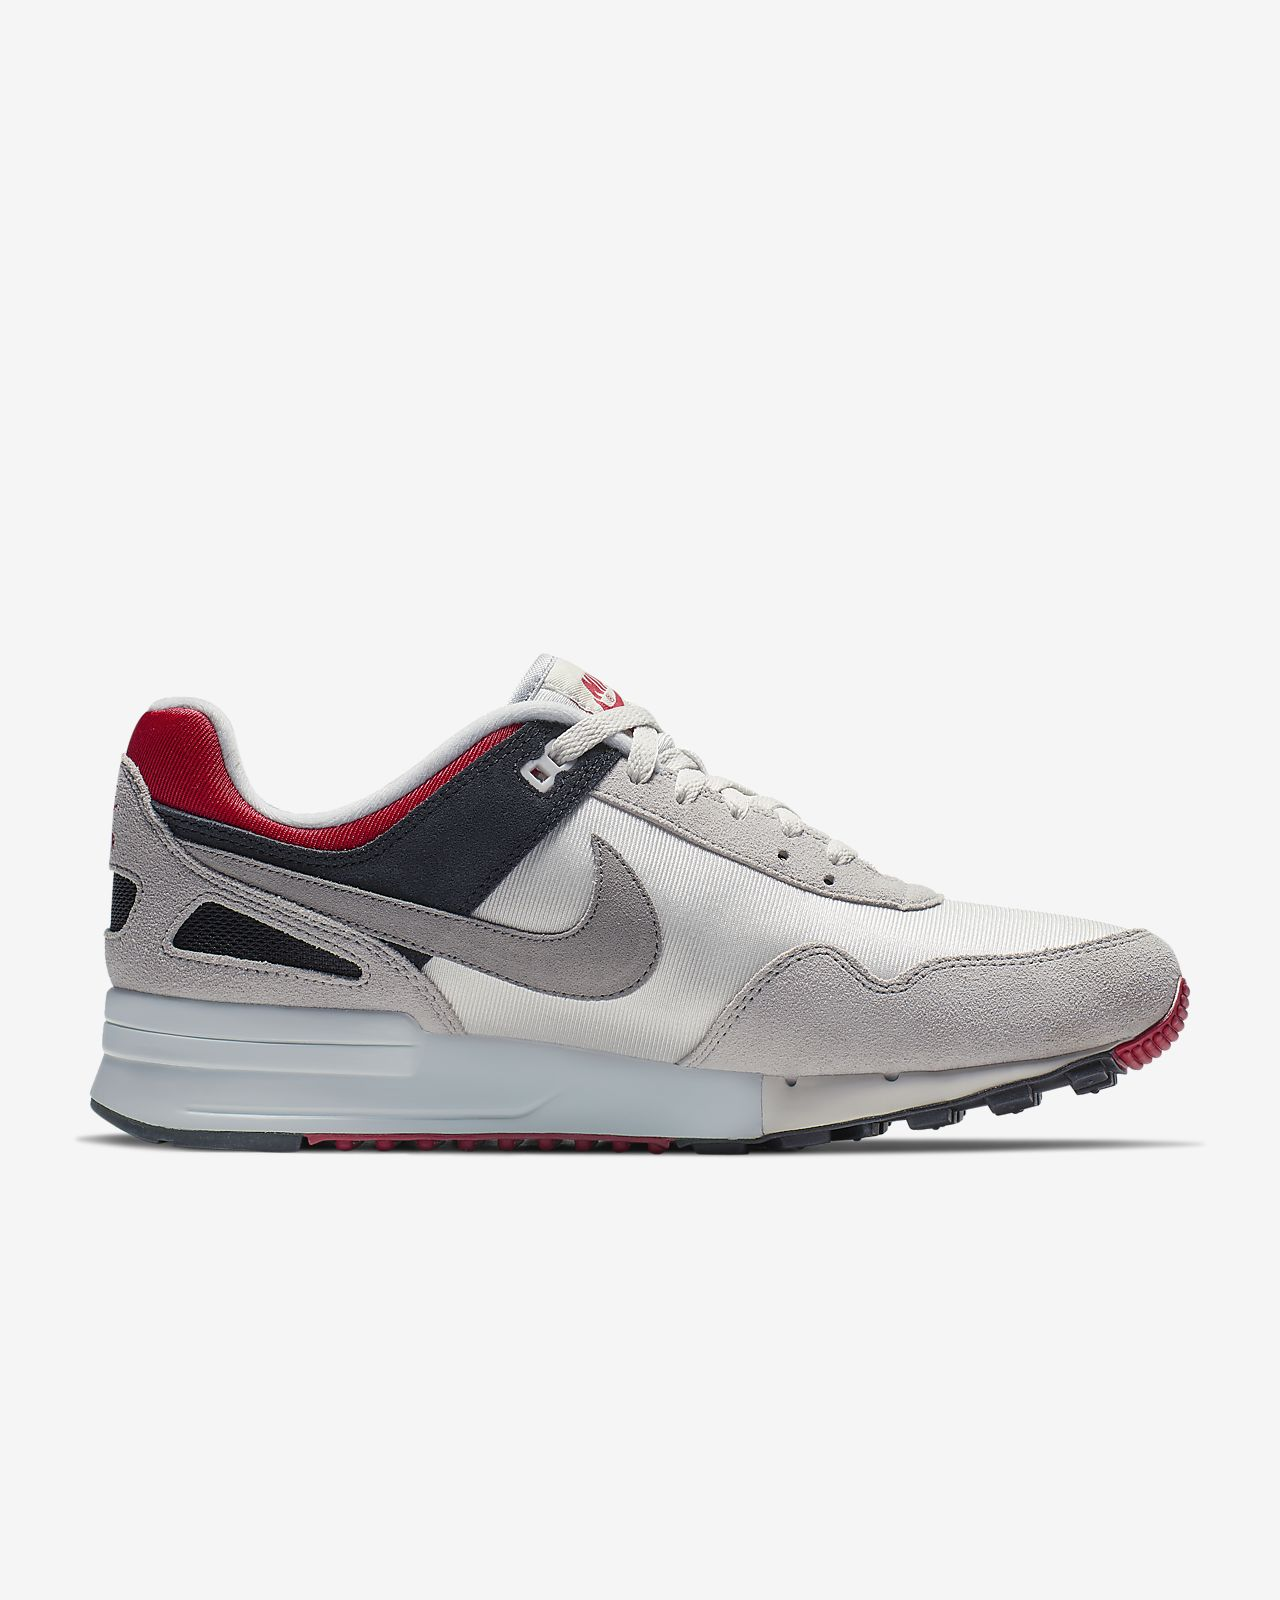 check out 50bde c98ad ... Nike Air Pegasus  89 SE Men s Shoe